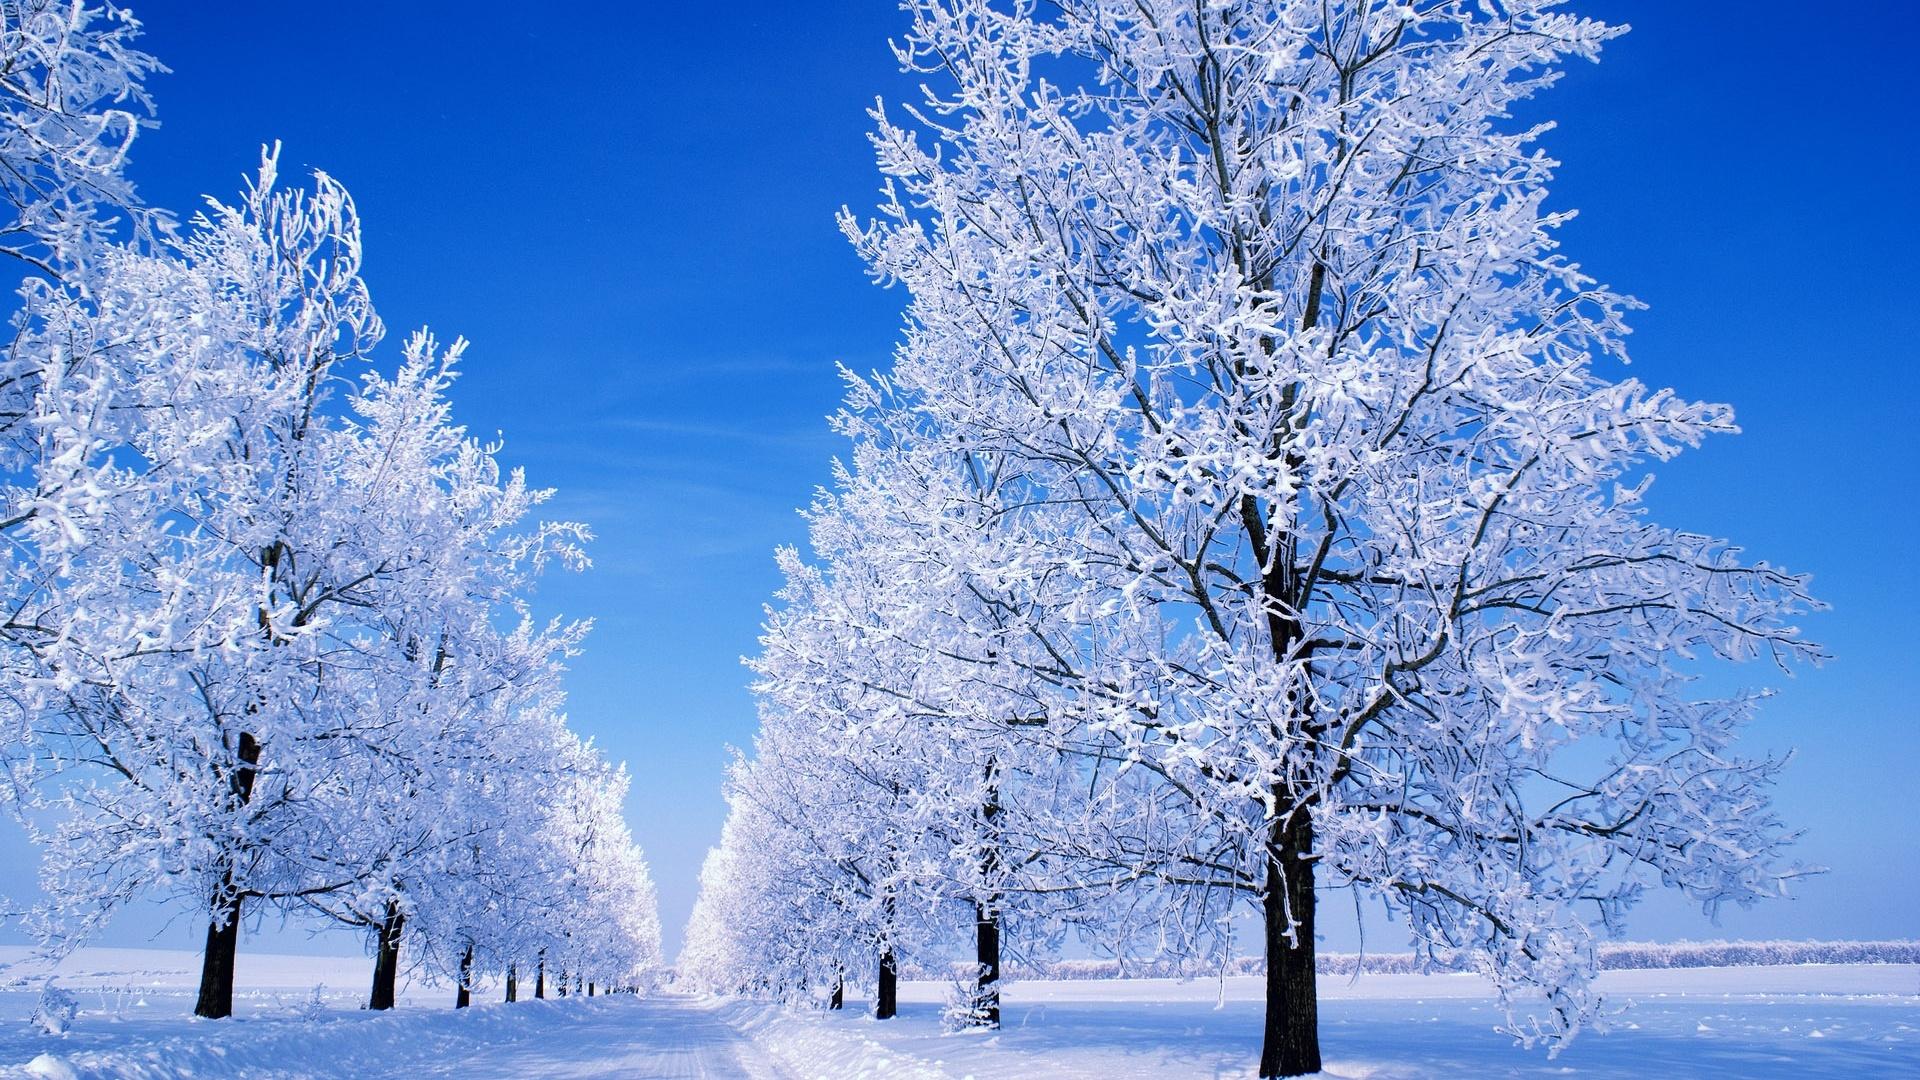 winter scene great snowy background wallpapers 1920x1080 1920x1080